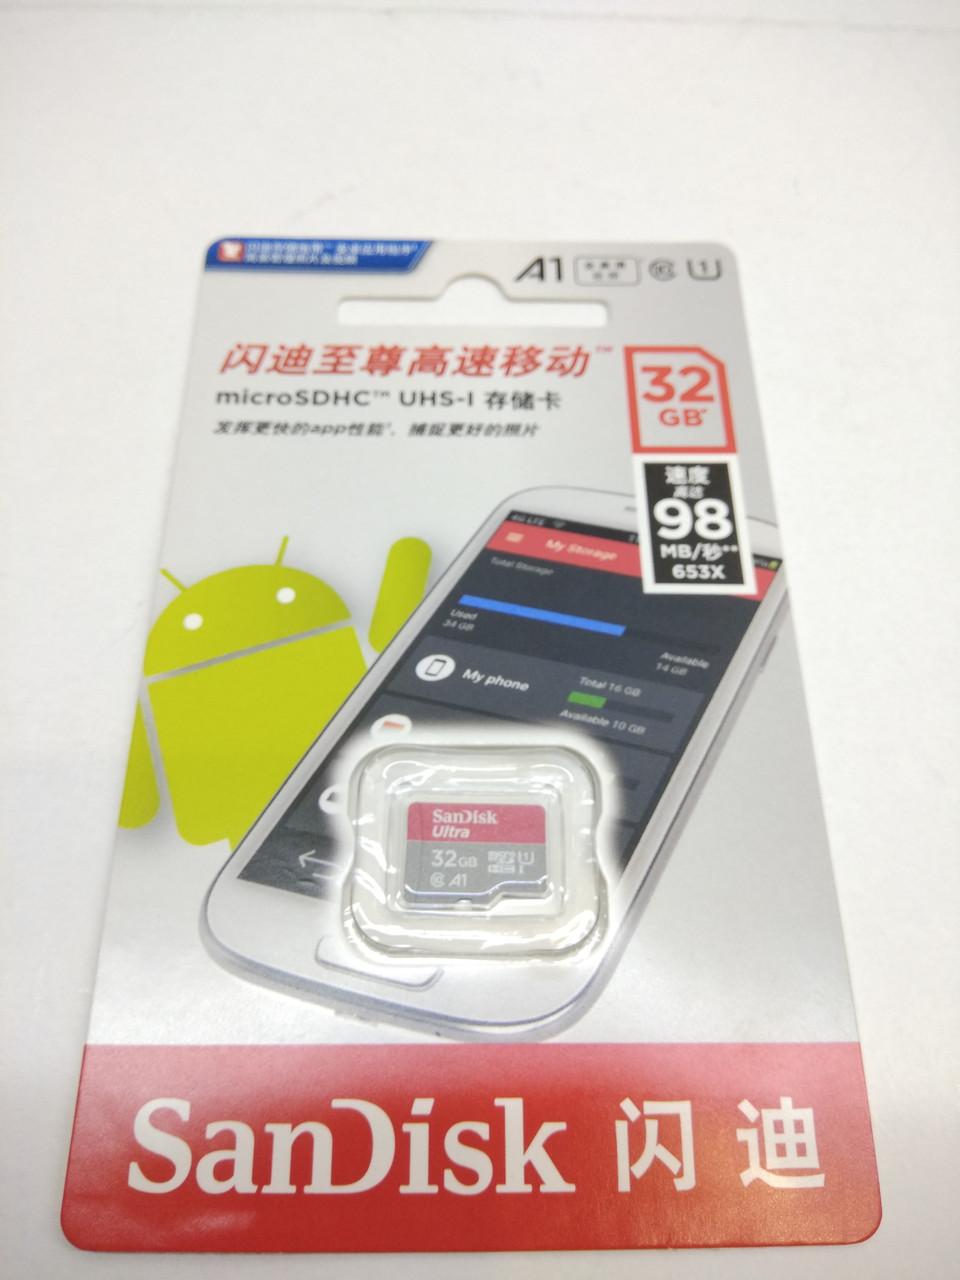 Карта памяті SanDisk Ultra A1 microSDHC UHS-I 32GB Class 10